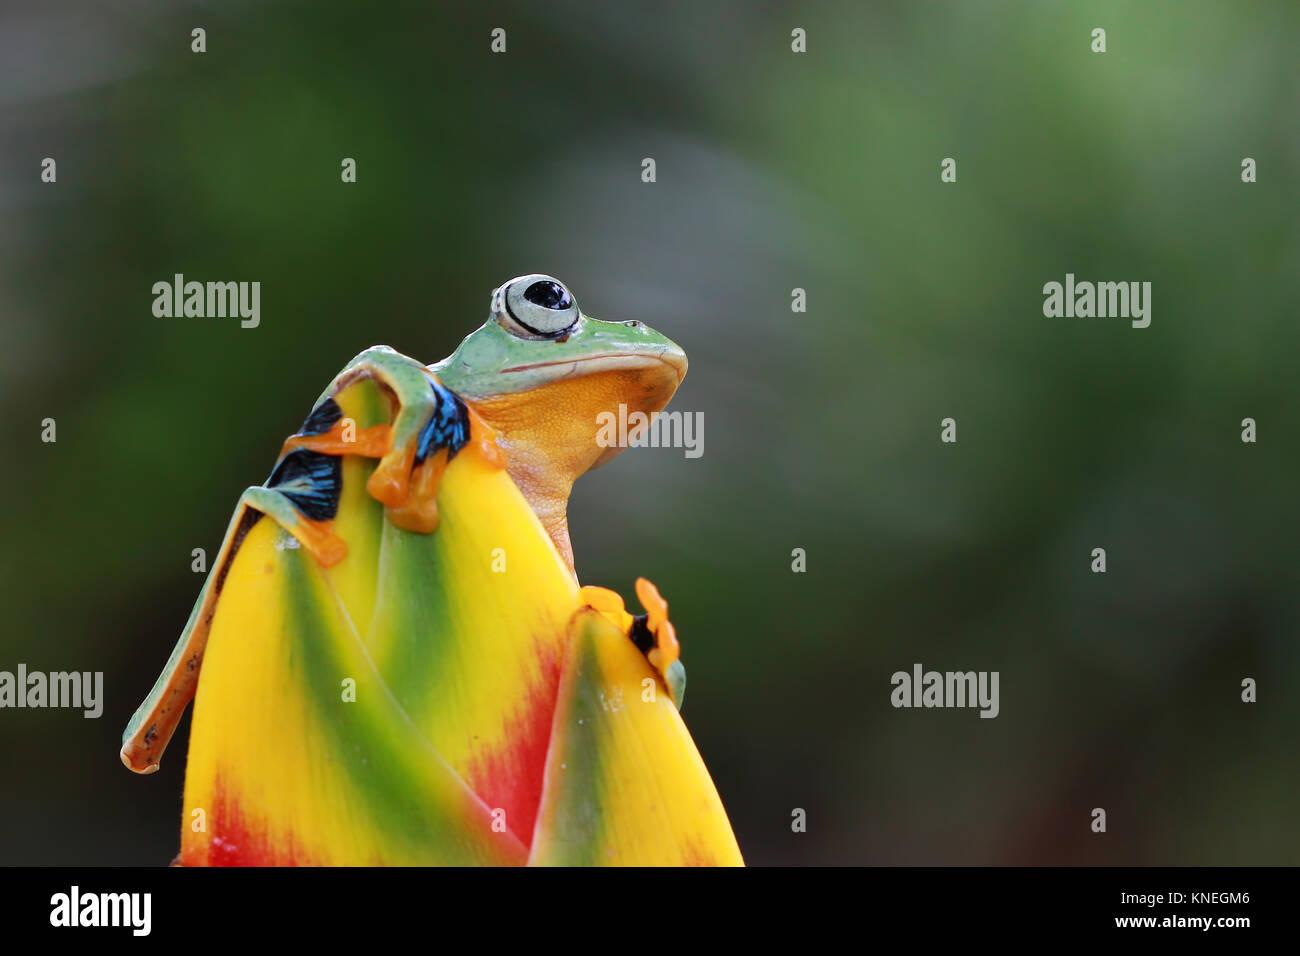 Tree frog (Rhacophorus reinwardtii) on a flower - Stock Image